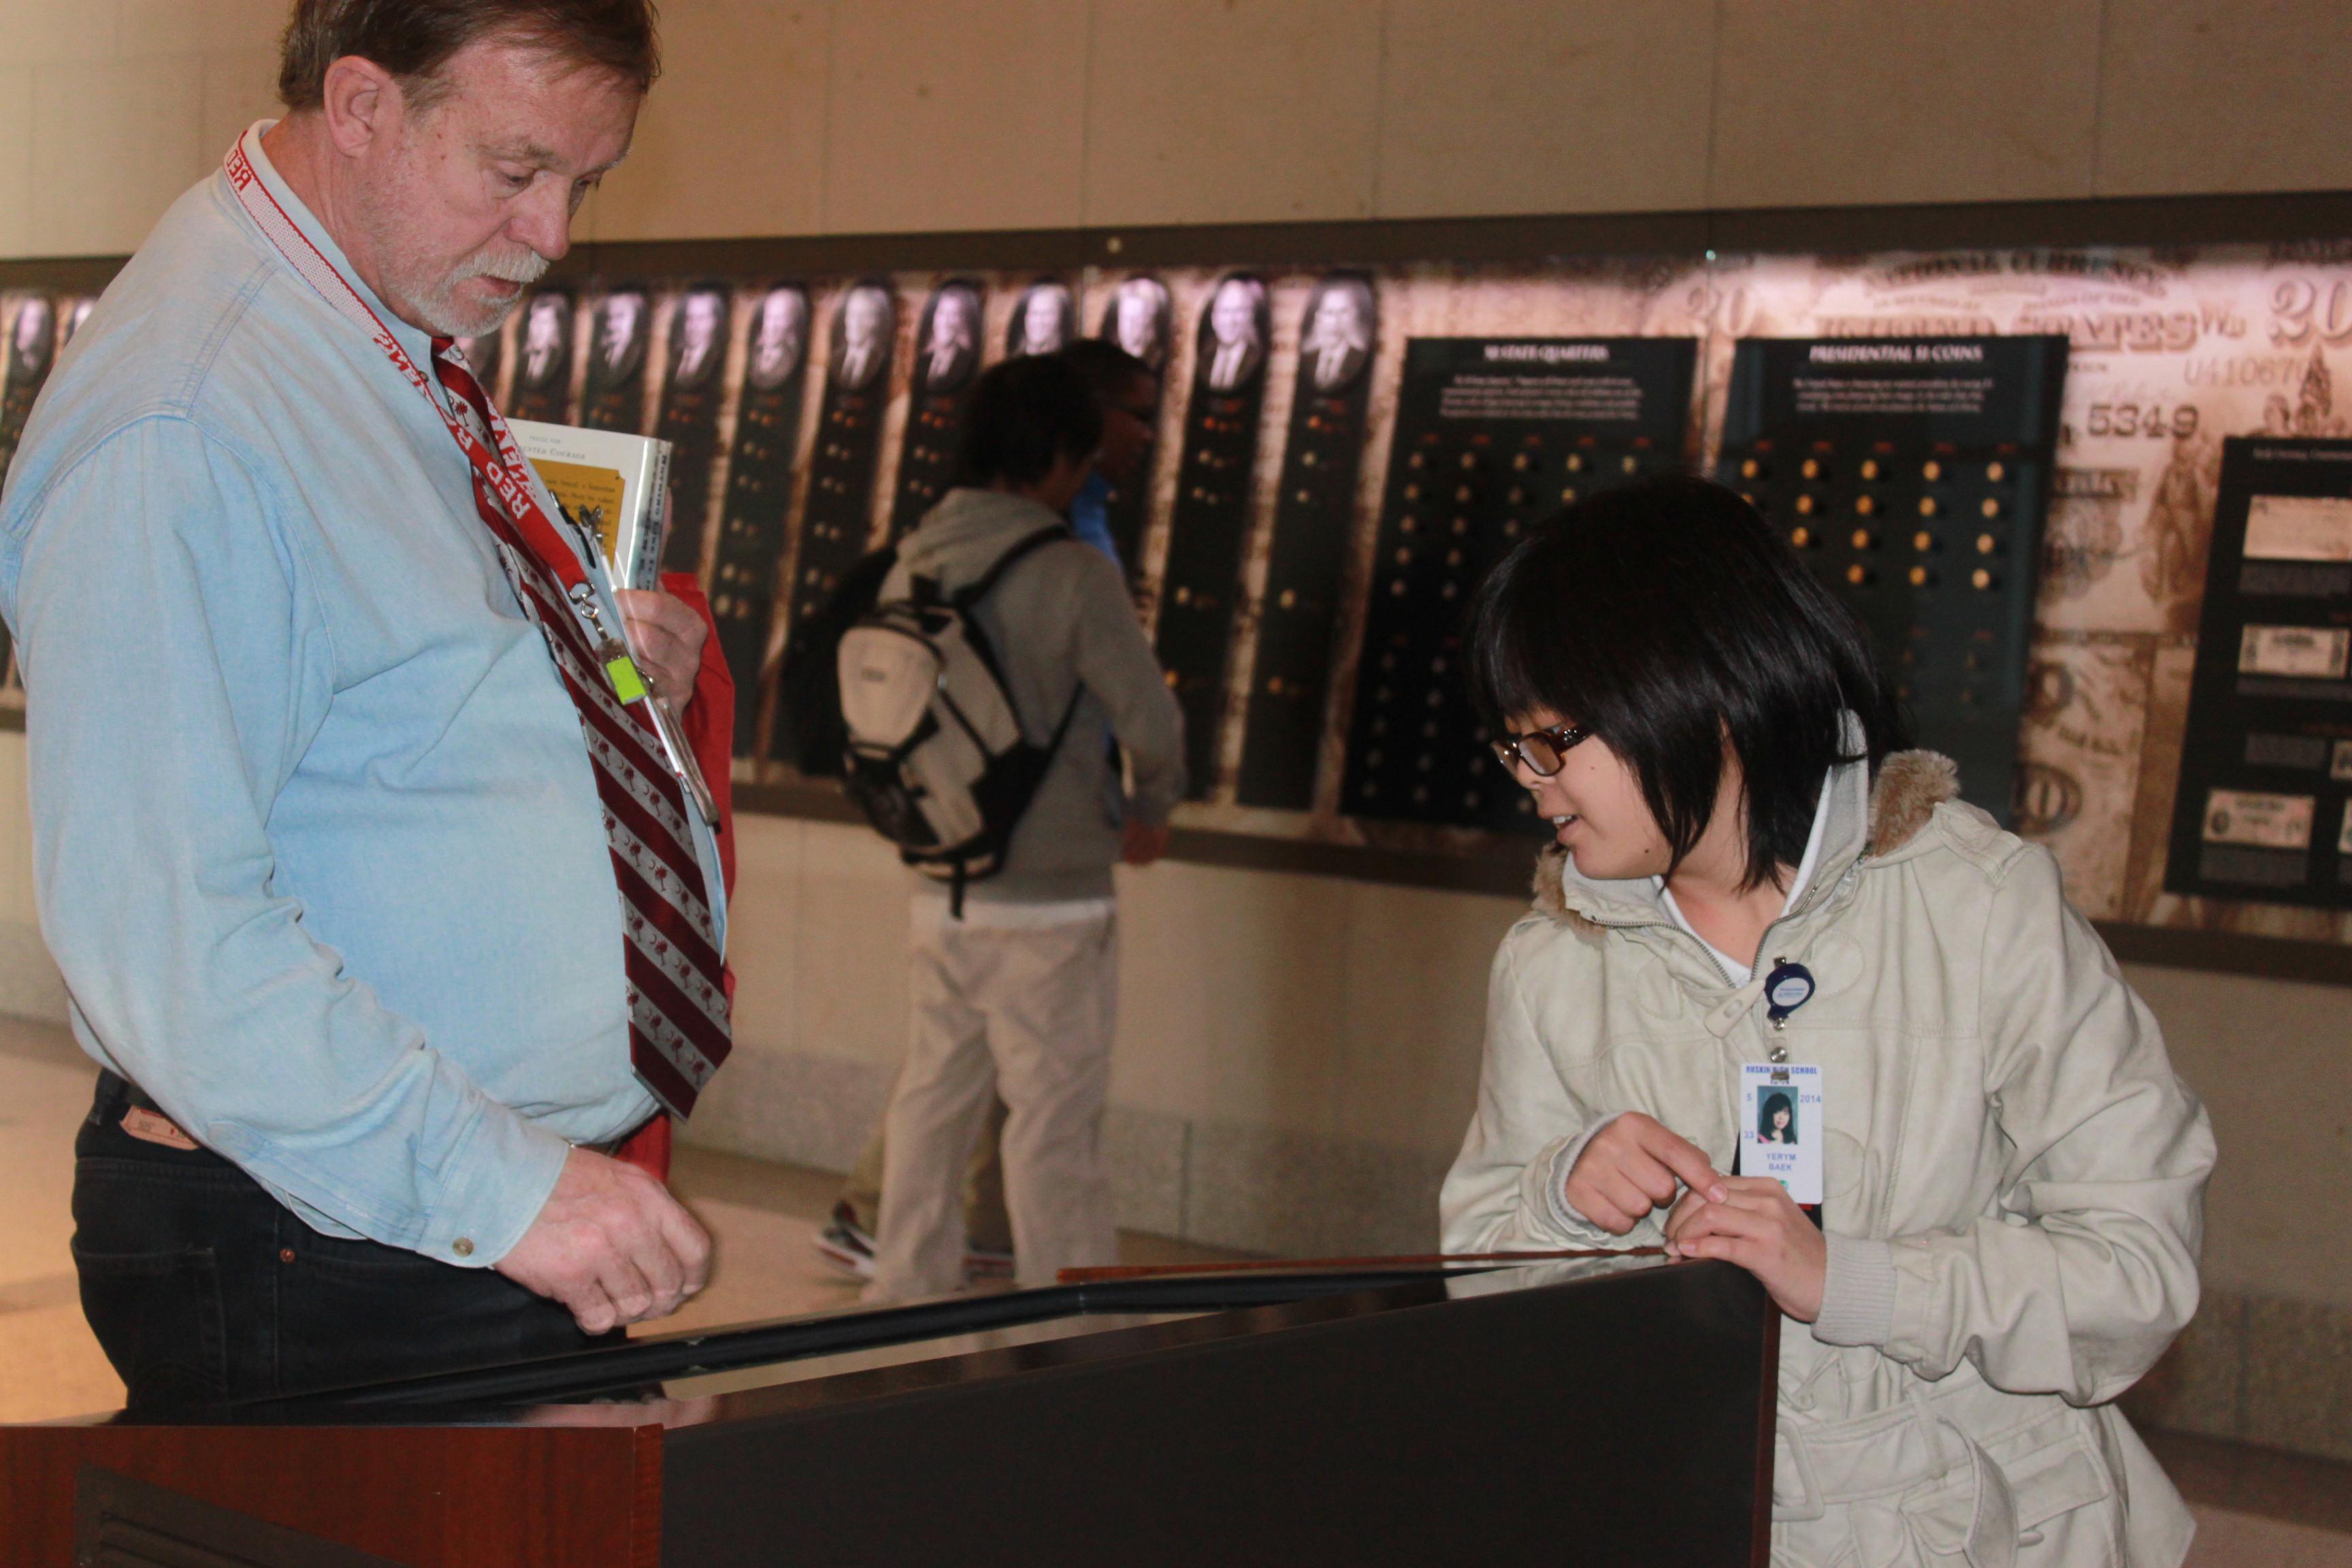 Social Studies teacher Robert Nellis examines an artifact with senior Yerym Baek at the WW! museum field trip.